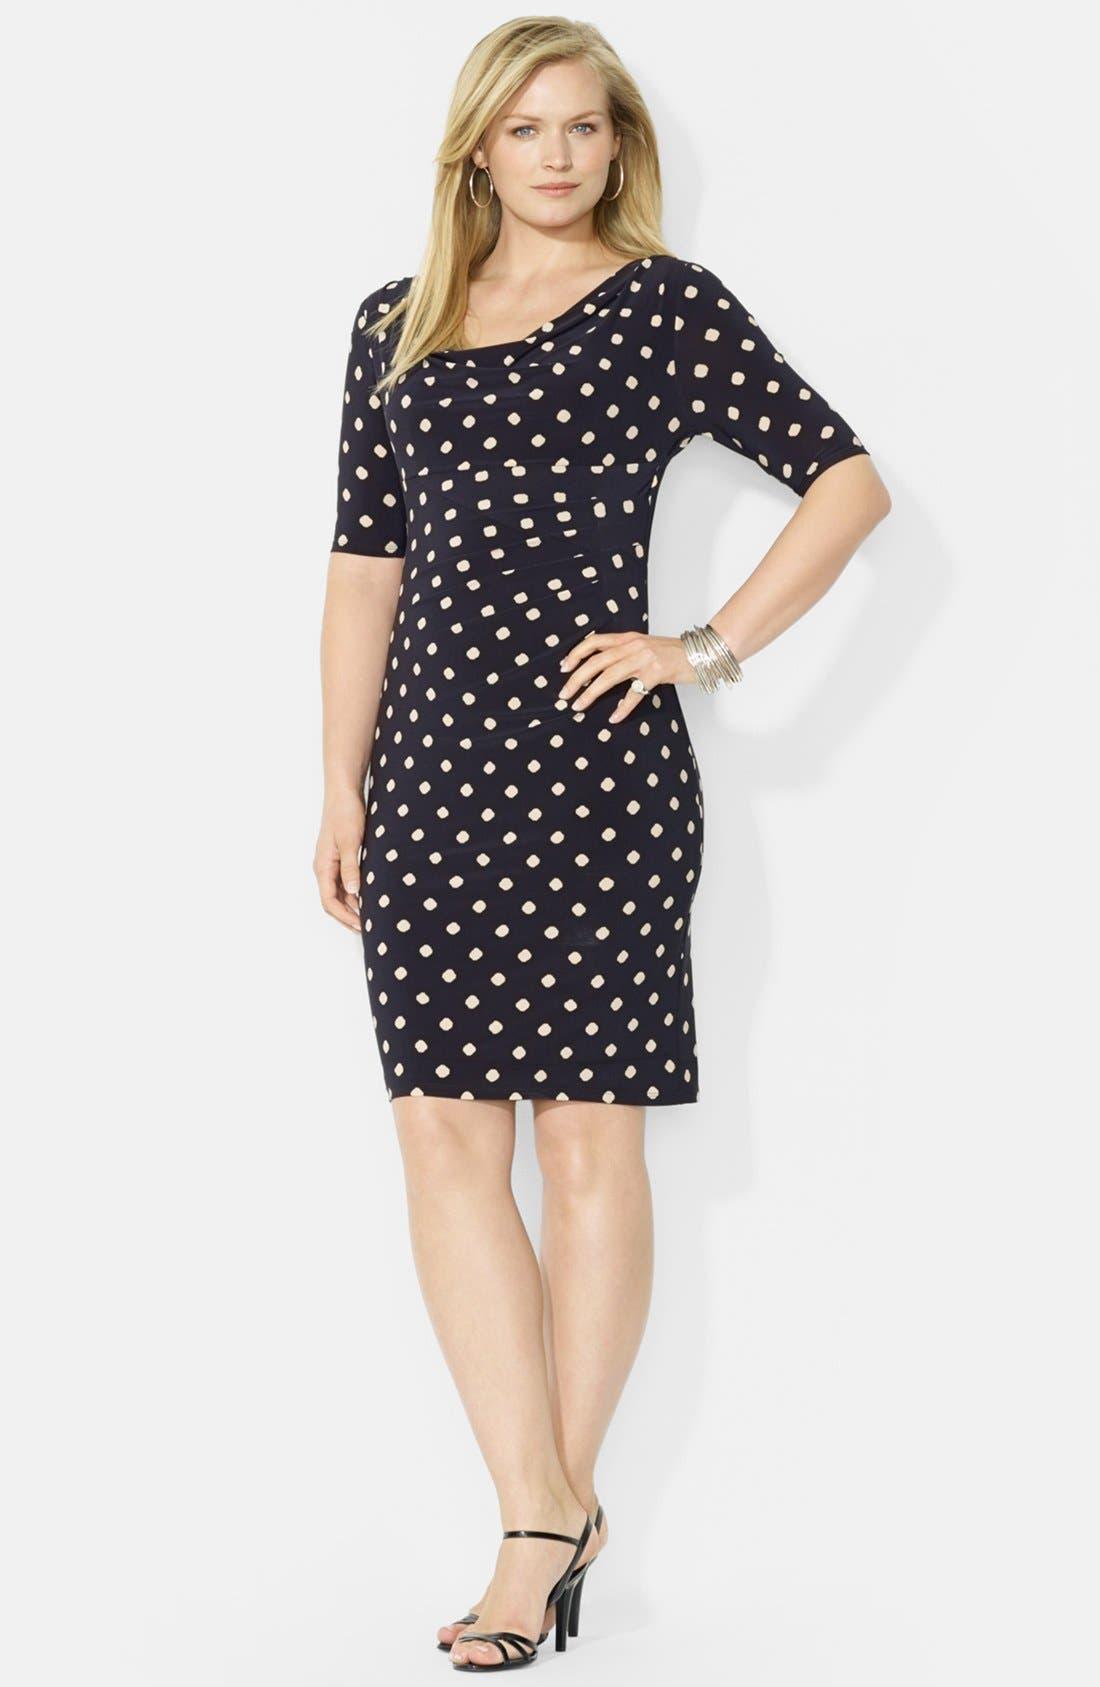 Alternate Image 1 Selected - Lauren by Ralph Lauren Cowl Neck Jersey Dress (Plus Size)